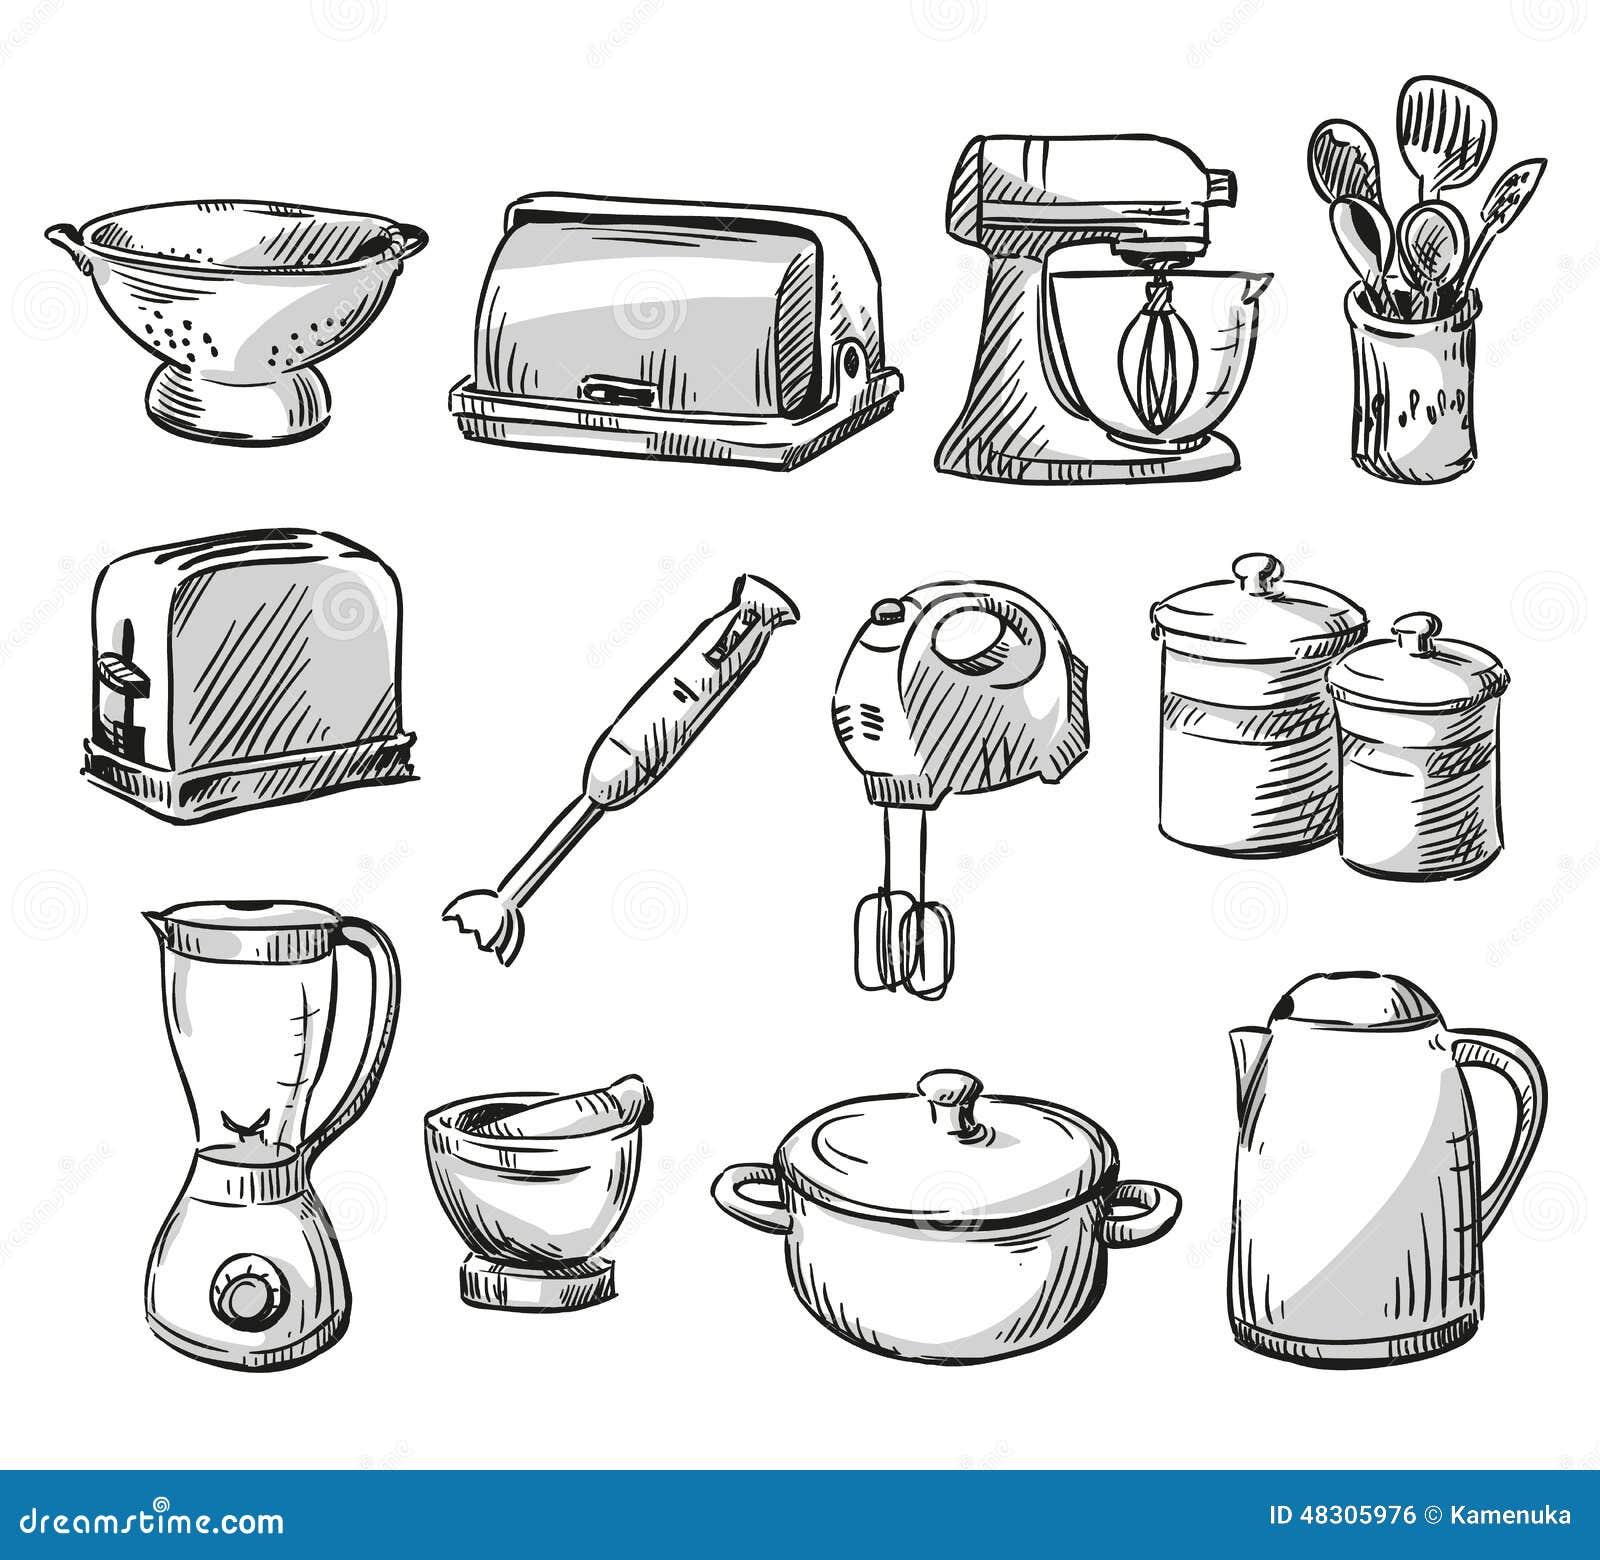 Dream Kitchen Design Drawing: Set Of Kitchen Appliance. Household Utensils Stock Vector